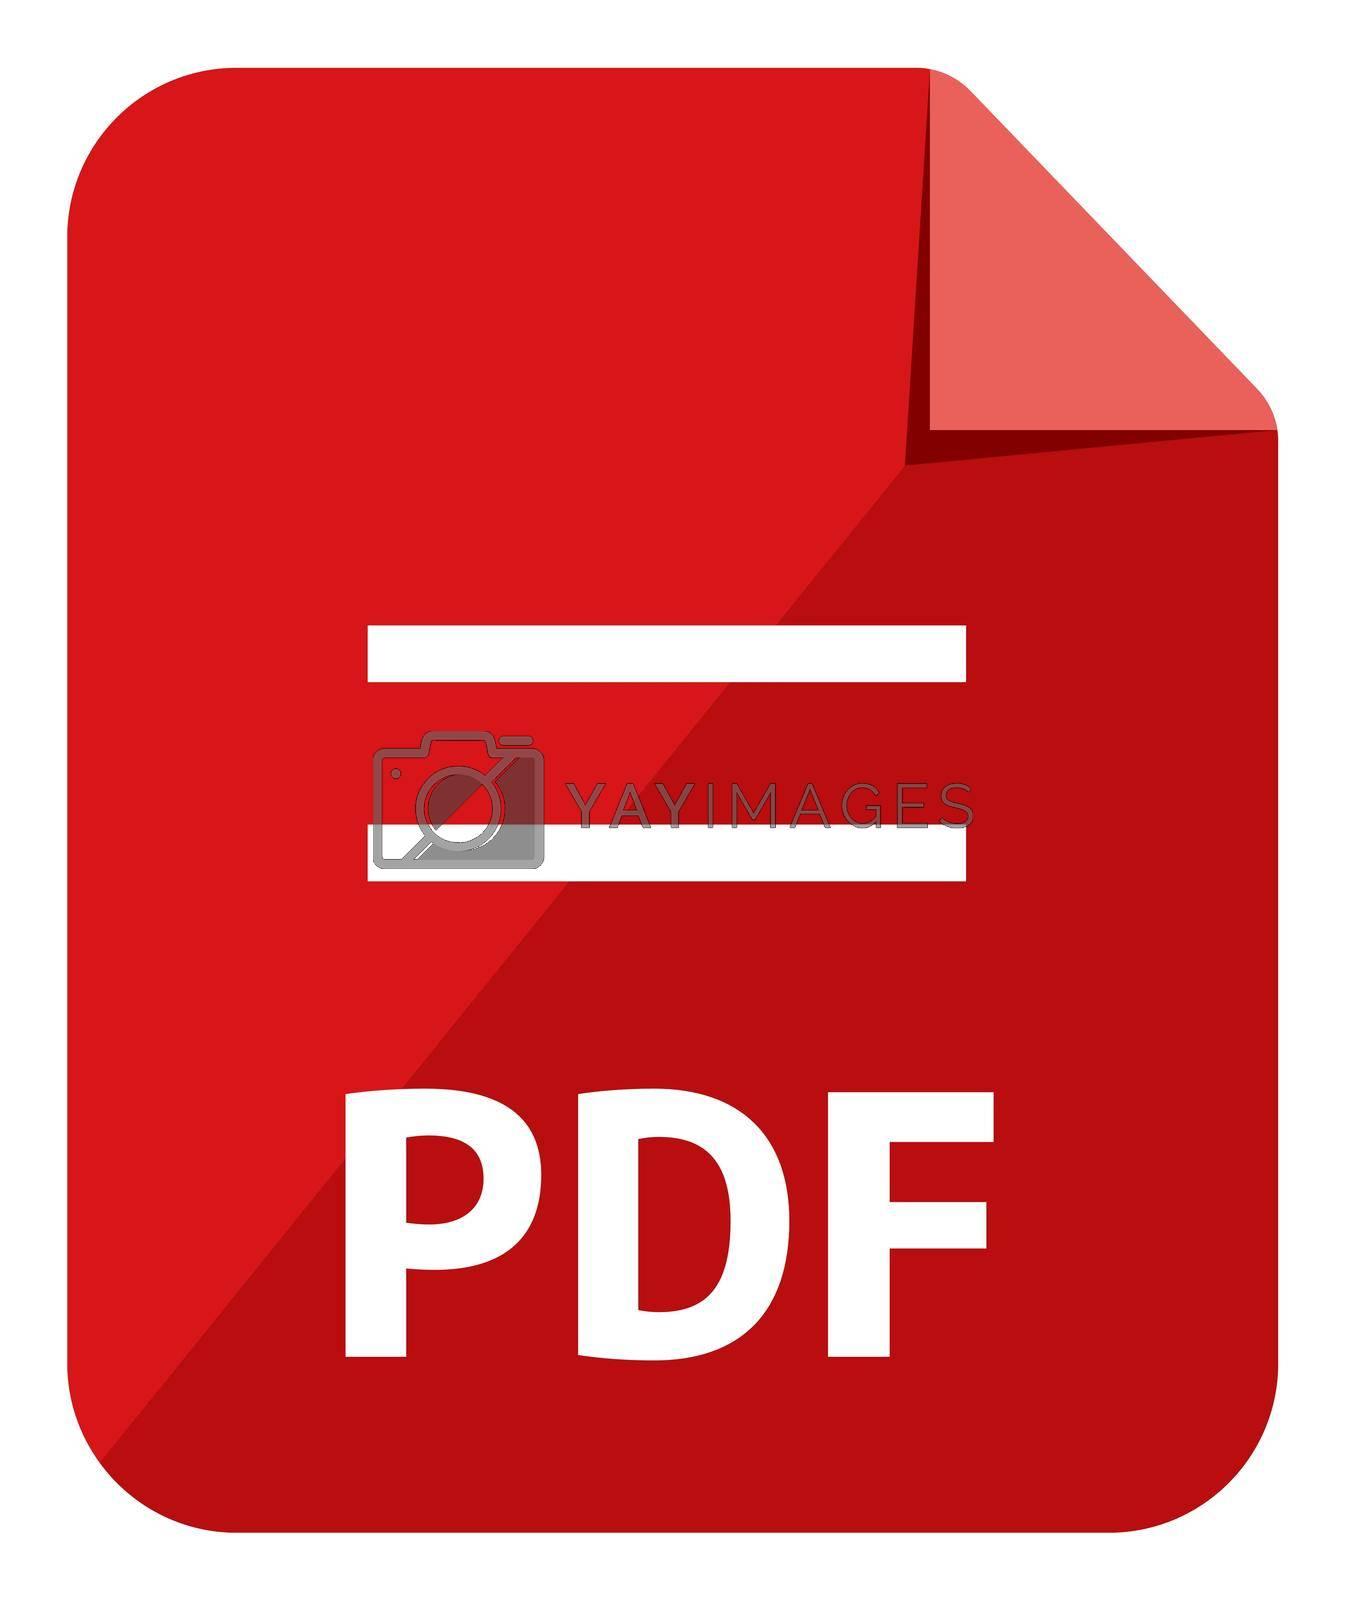 PDF icon   Major file format vector icon illustration  ( color version )